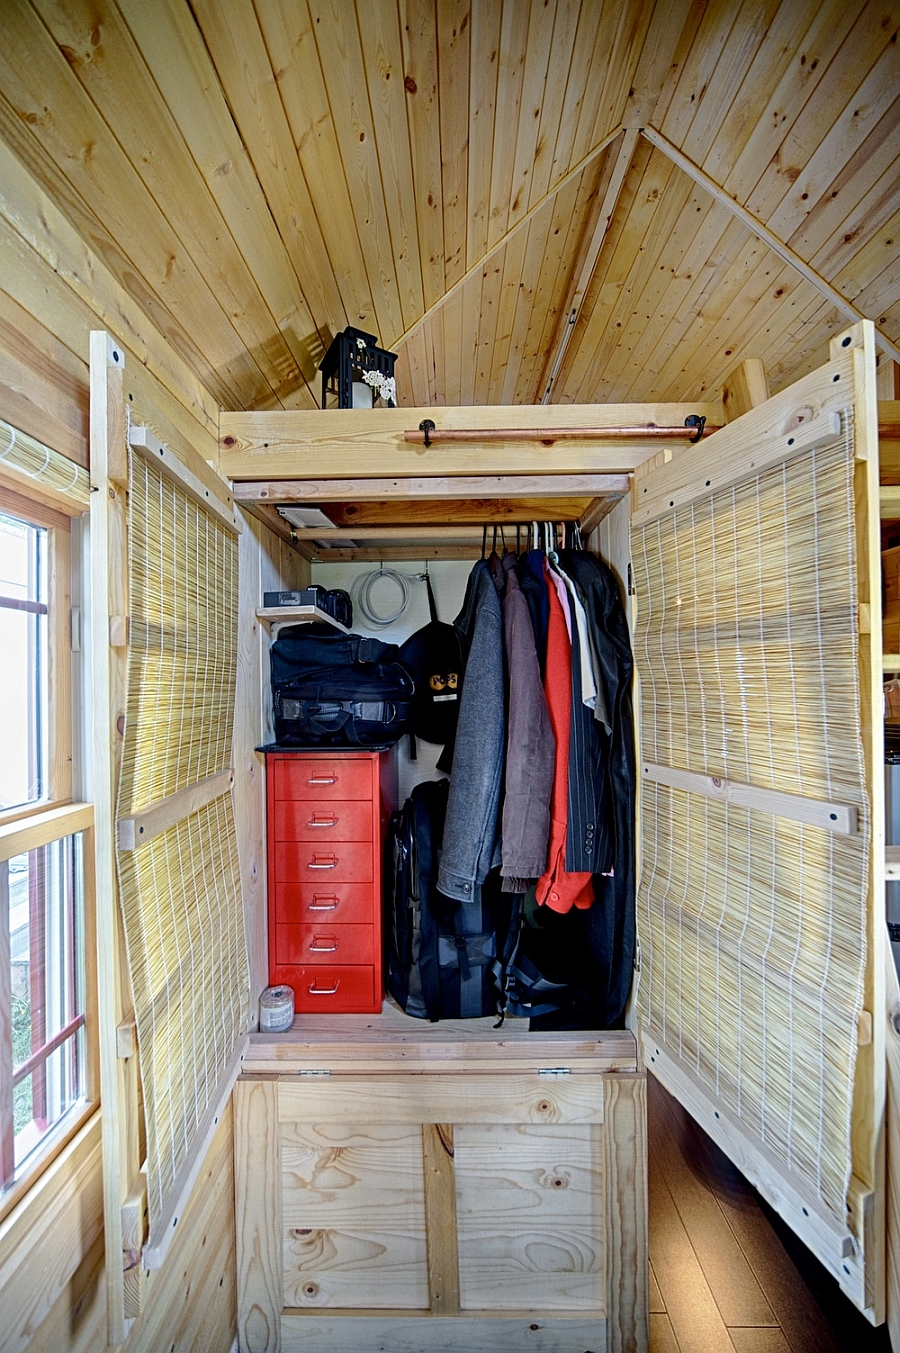 savvy wardrobe and storage area